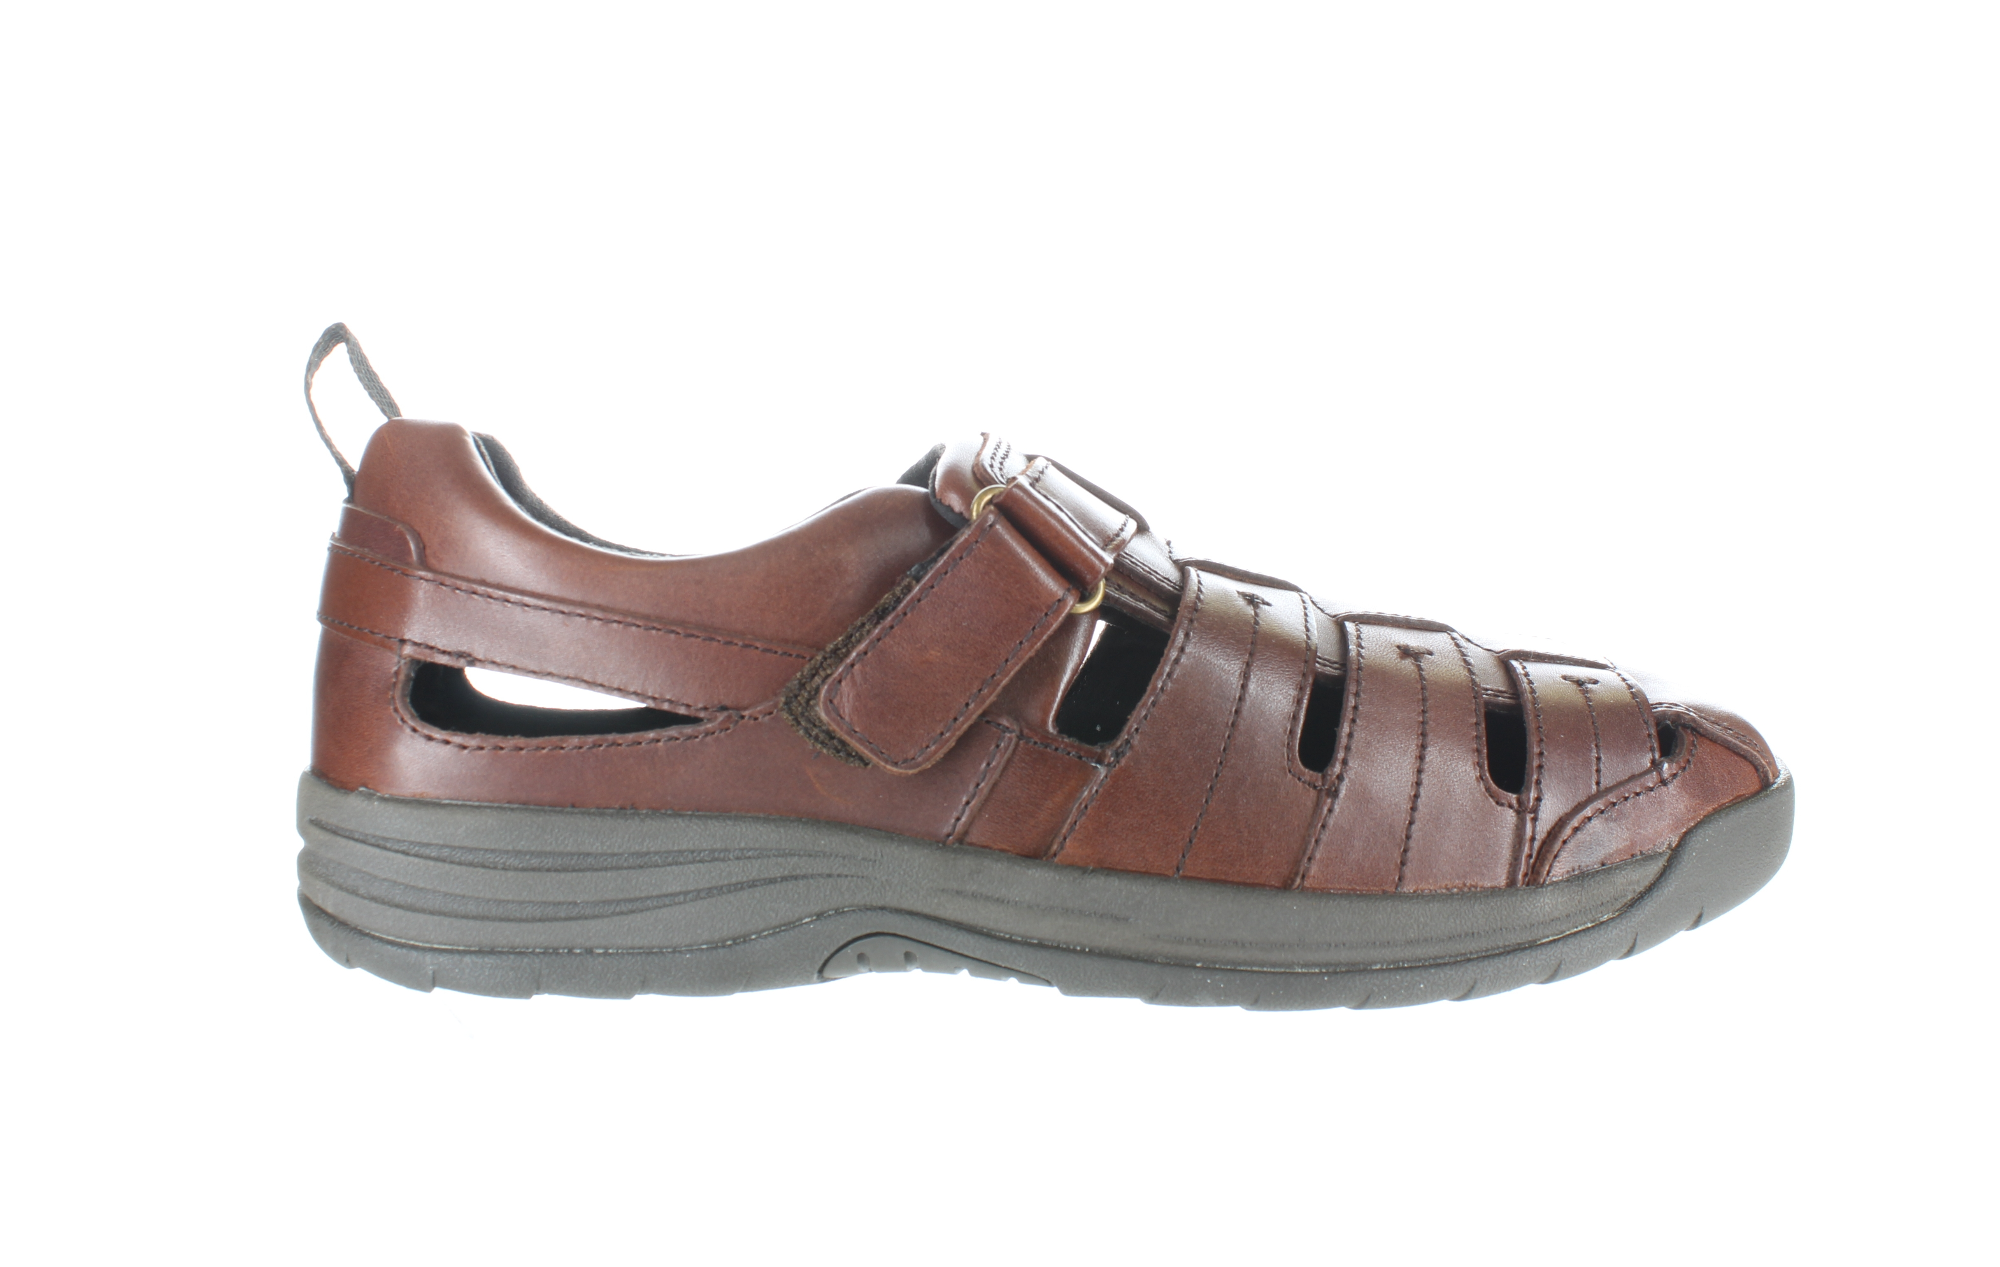 Drew Shoe Mens Dublin Brandy Leather Fisherman Sandals Size 15 (Wide) (1801426)